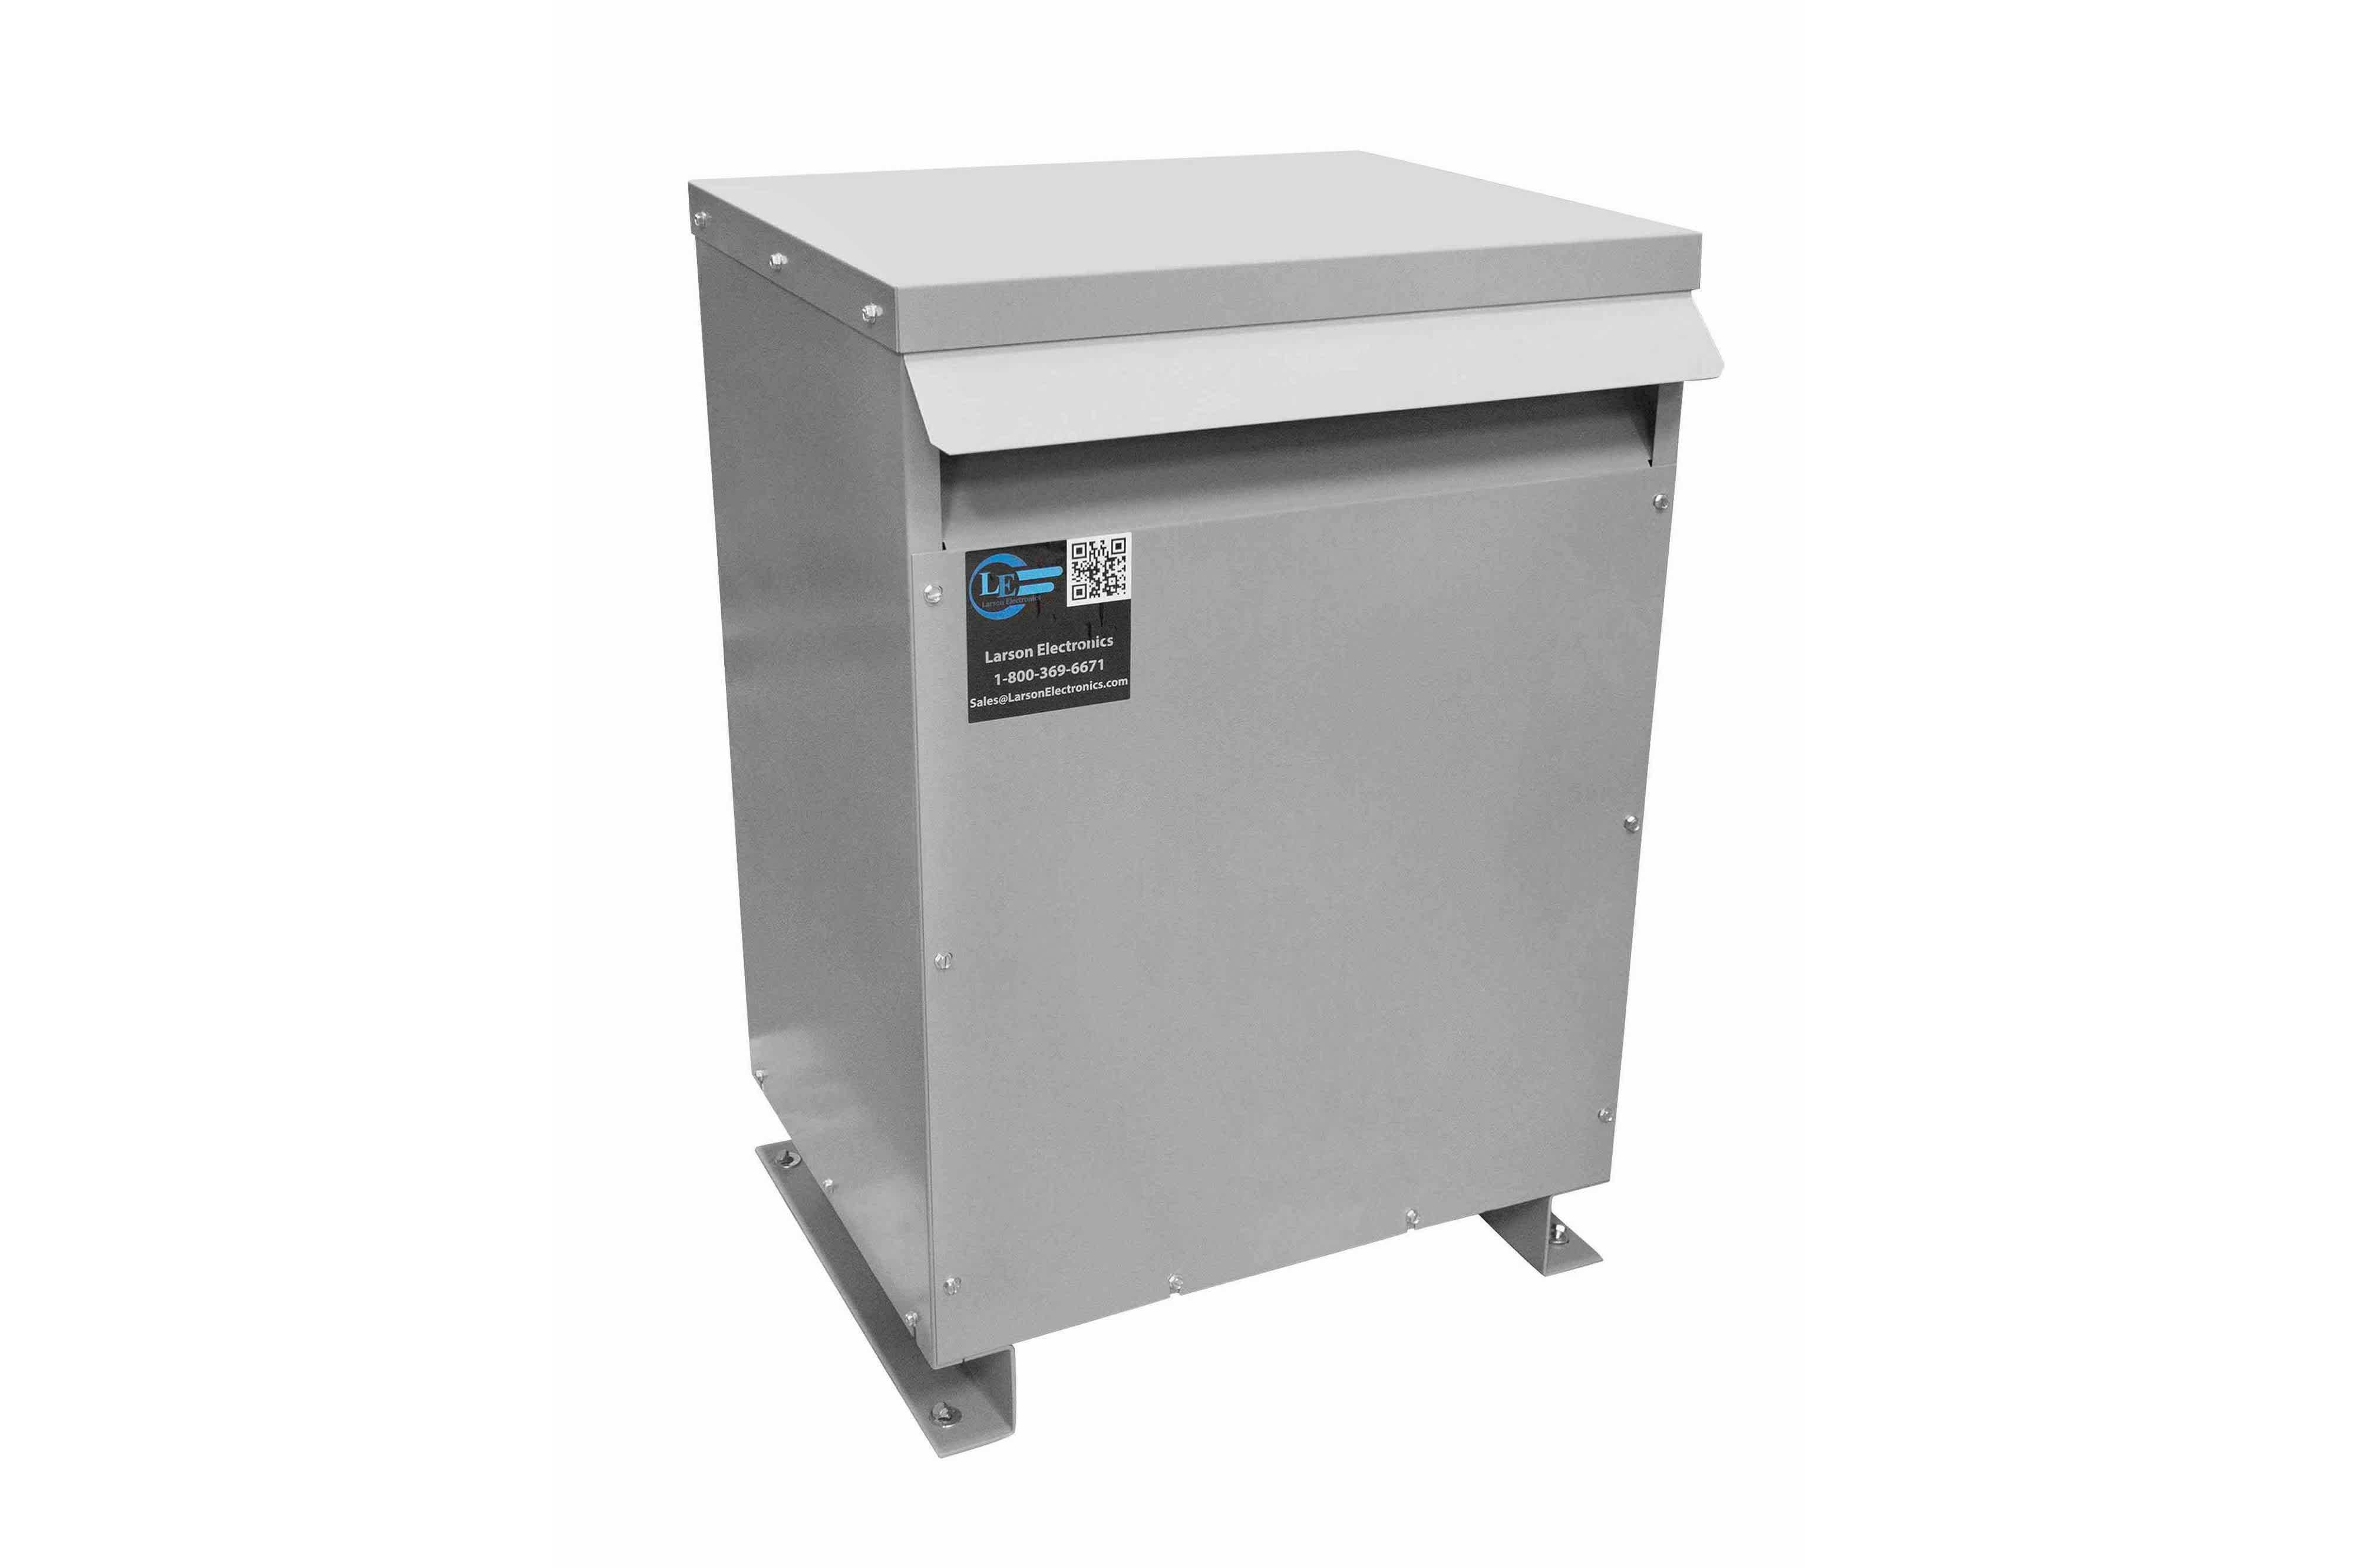 29 kVA 3PH Isolation Transformer, 380V Wye Primary, 480Y/277 Wye-N Secondary, N3R, Ventilated, 60 Hz